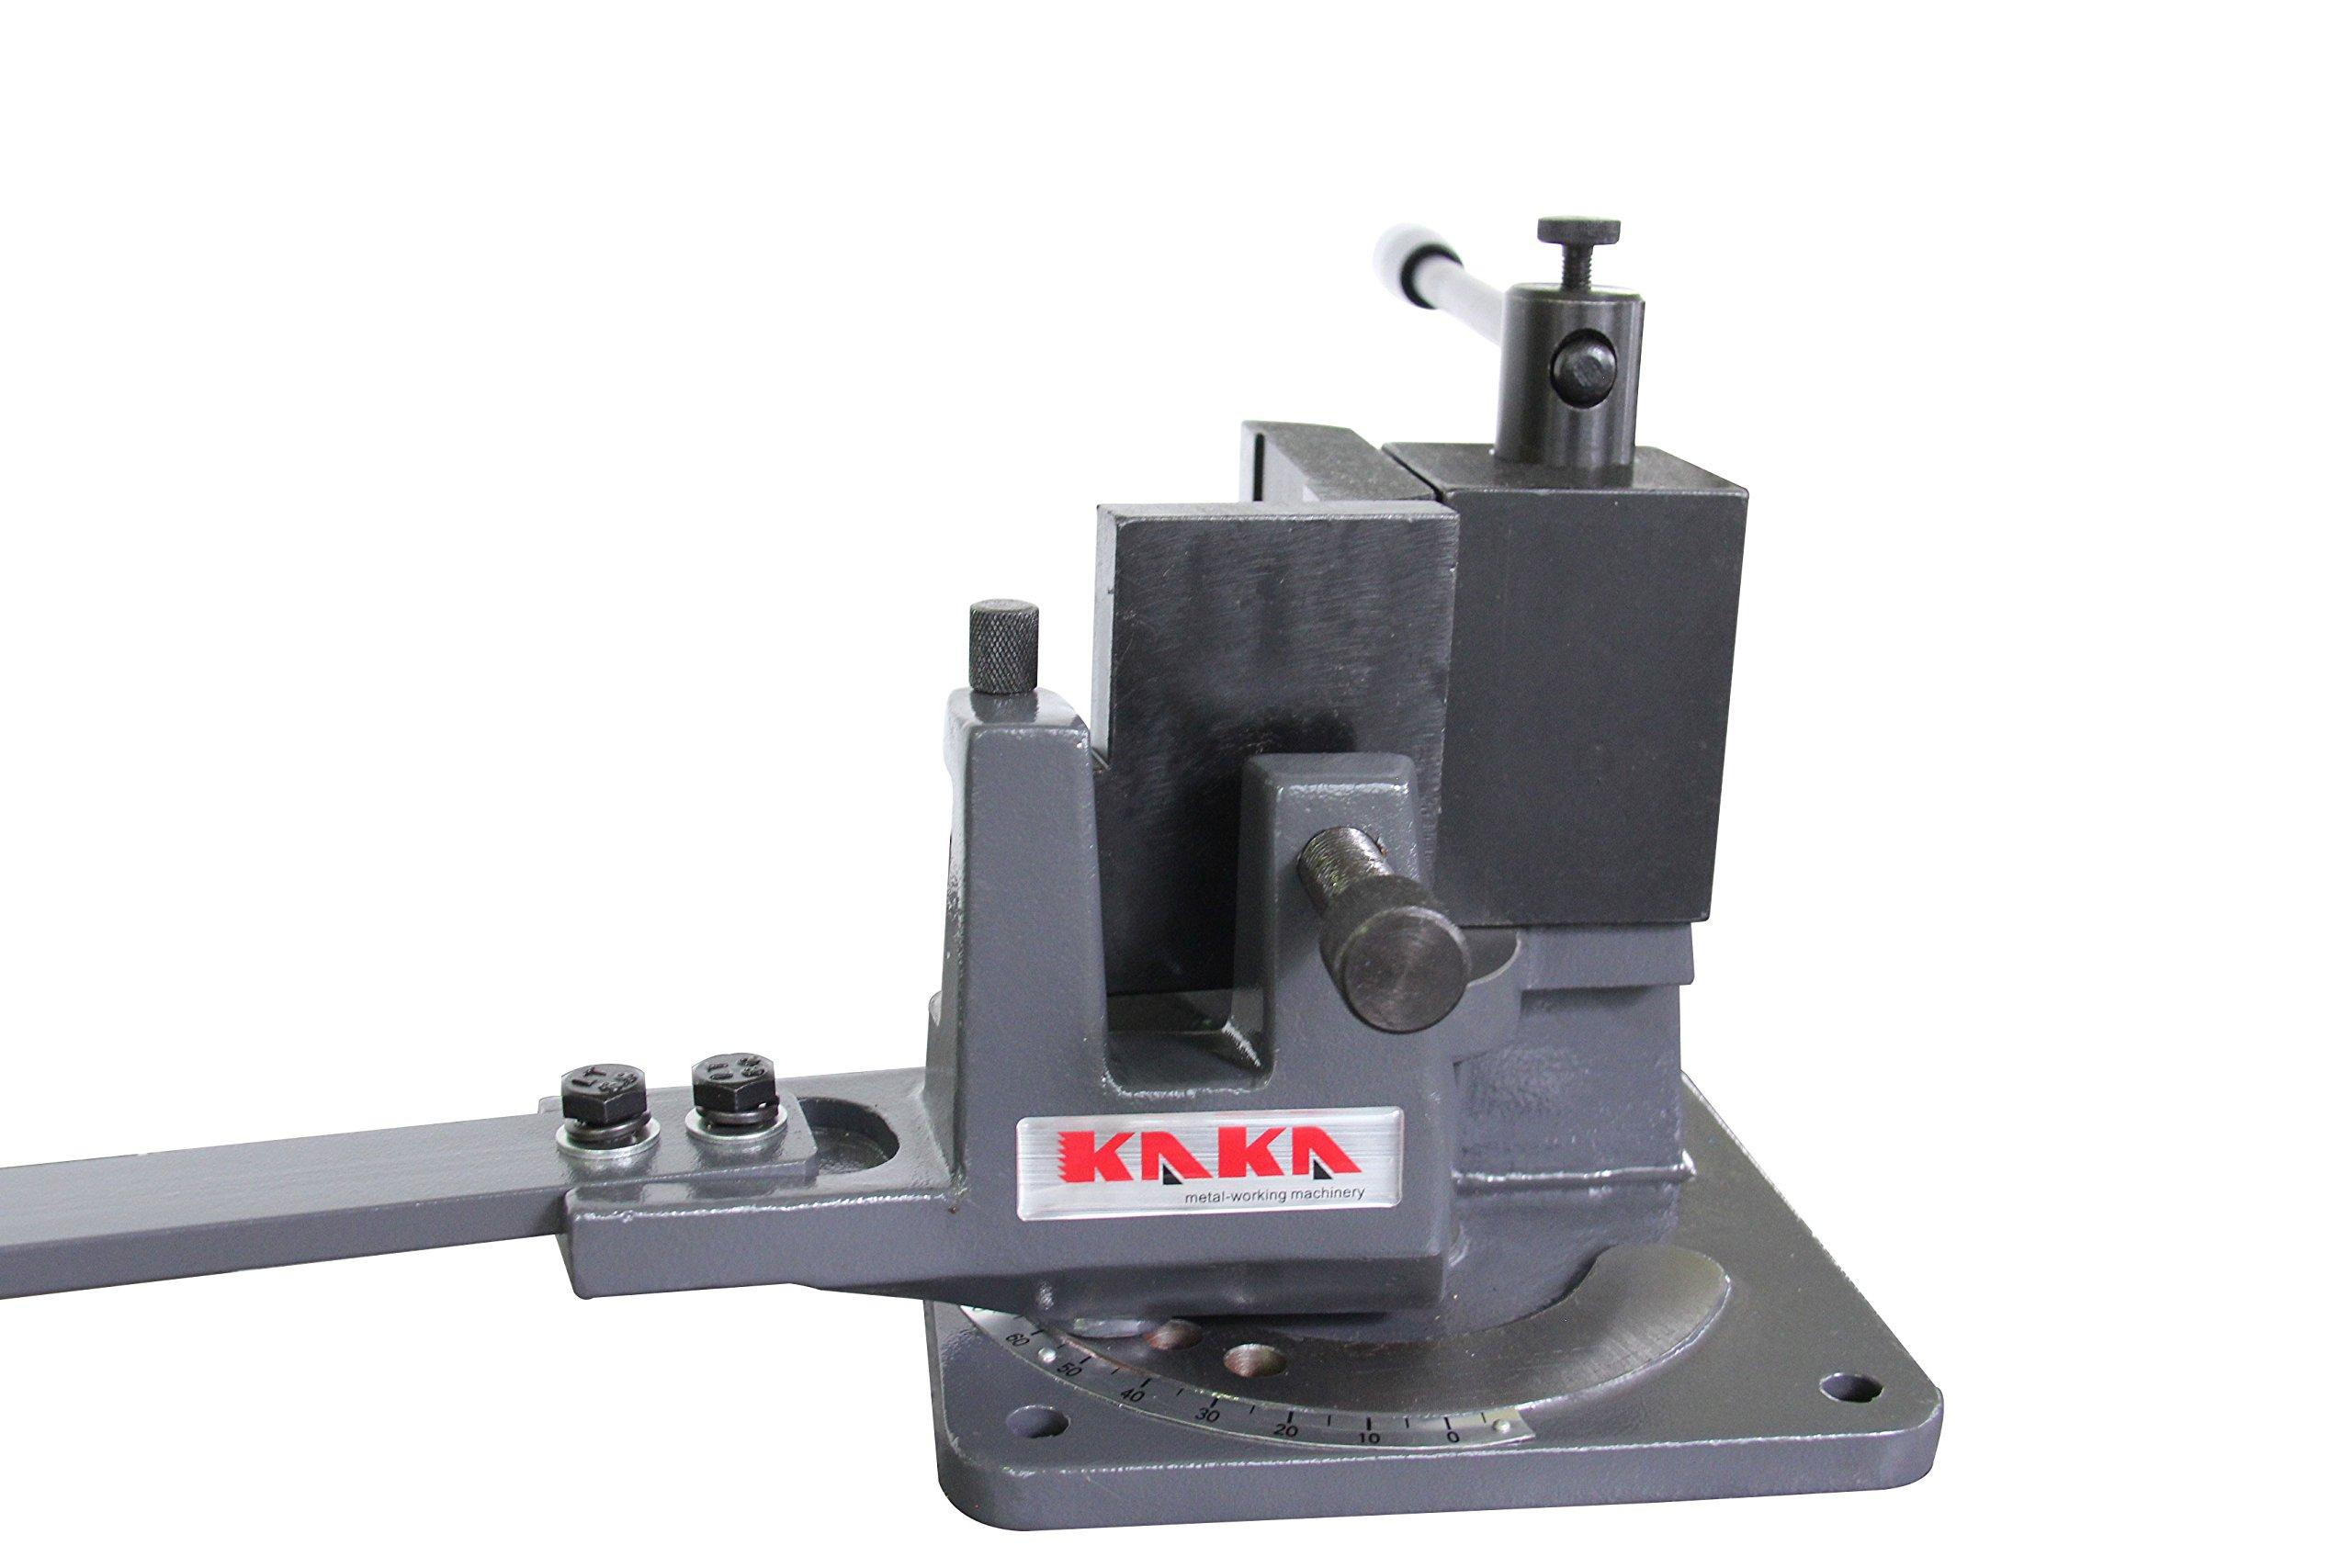 KAKA Industrial UB-70 Cast-Iron Metal Bender, 2-3/4-Inch Hot and Cot Sheet Metal Bender, Solid Design, High Precision Strip Steel, Flat Steel, Round Steel and Angle Steel Metal Bender